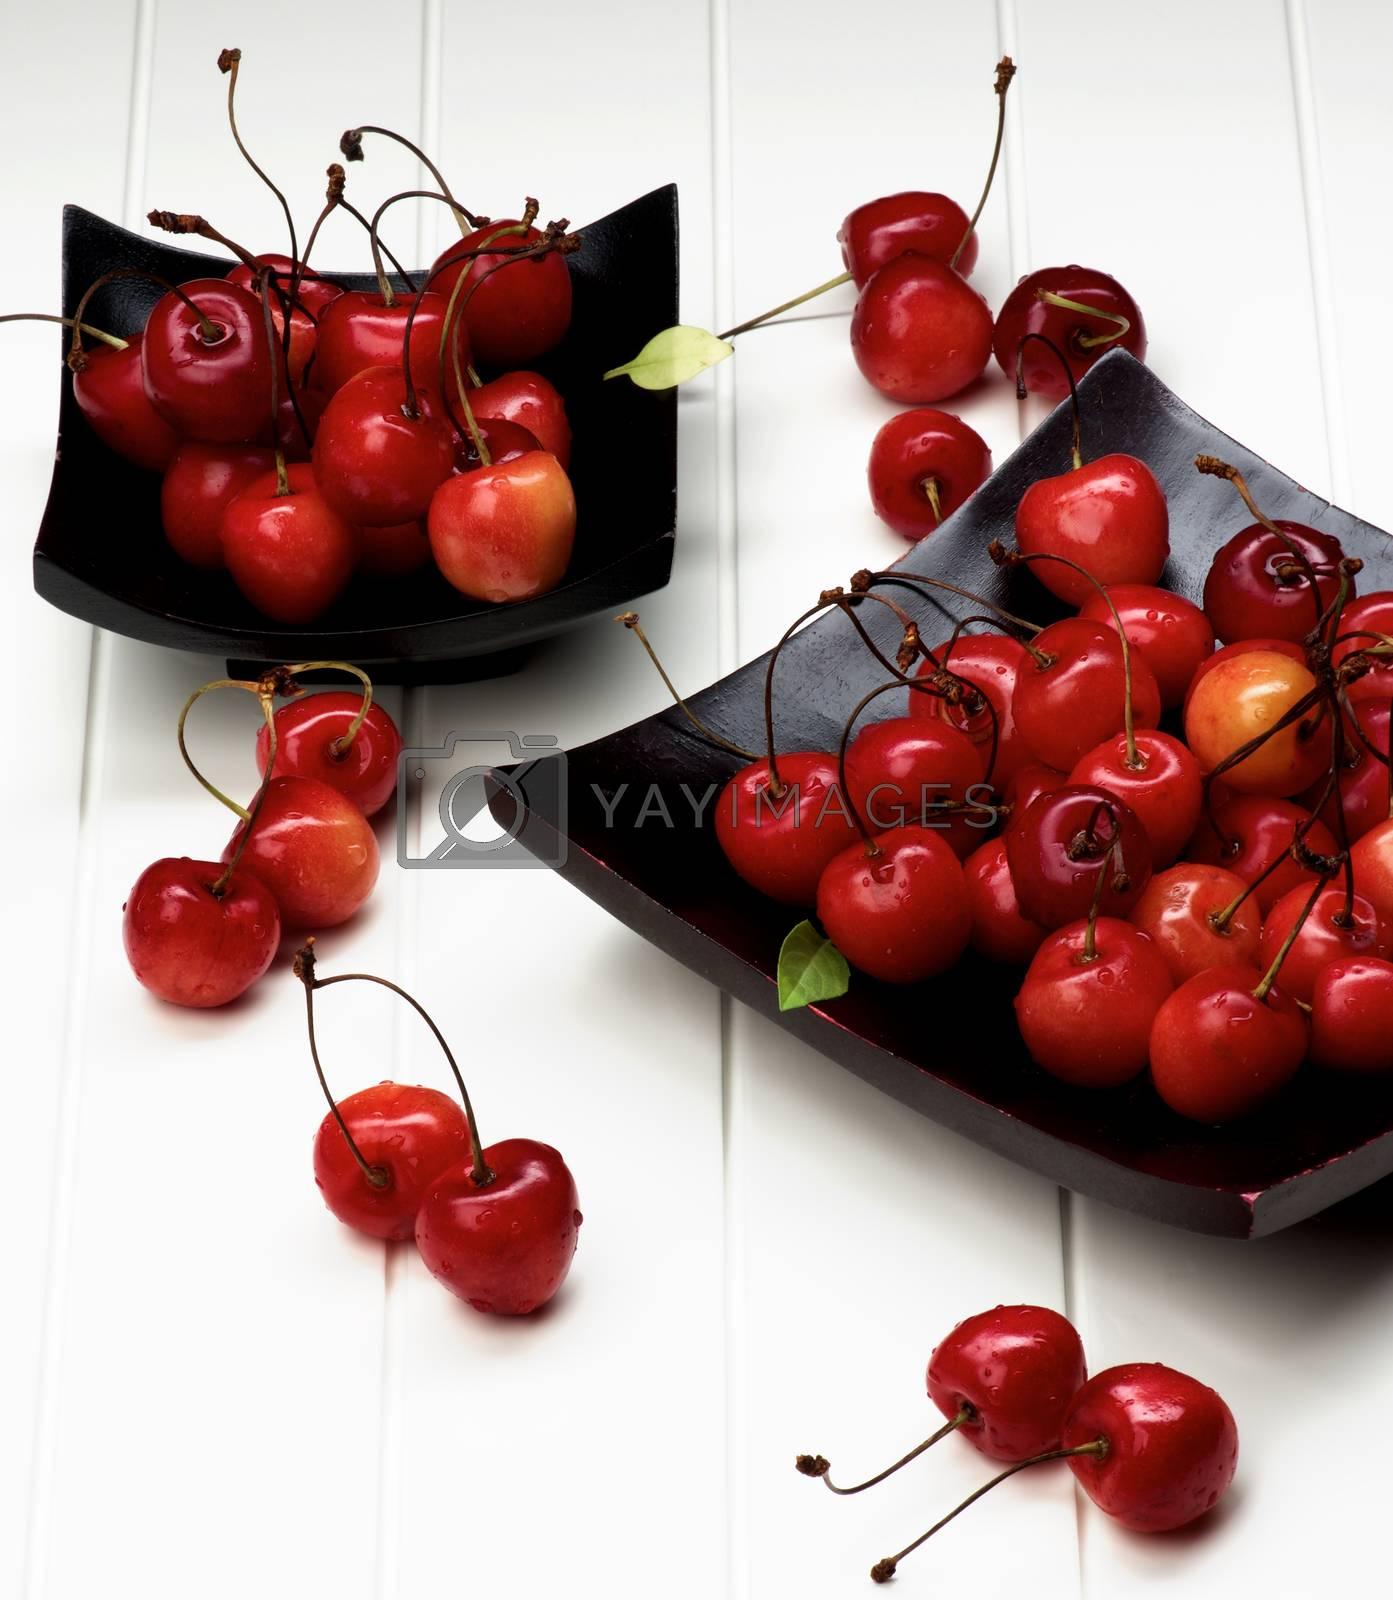 Arrangement of Fresh Ripe Sweet Maraschino Cherries in Two Black Wooden Plates closeup on Plank White background